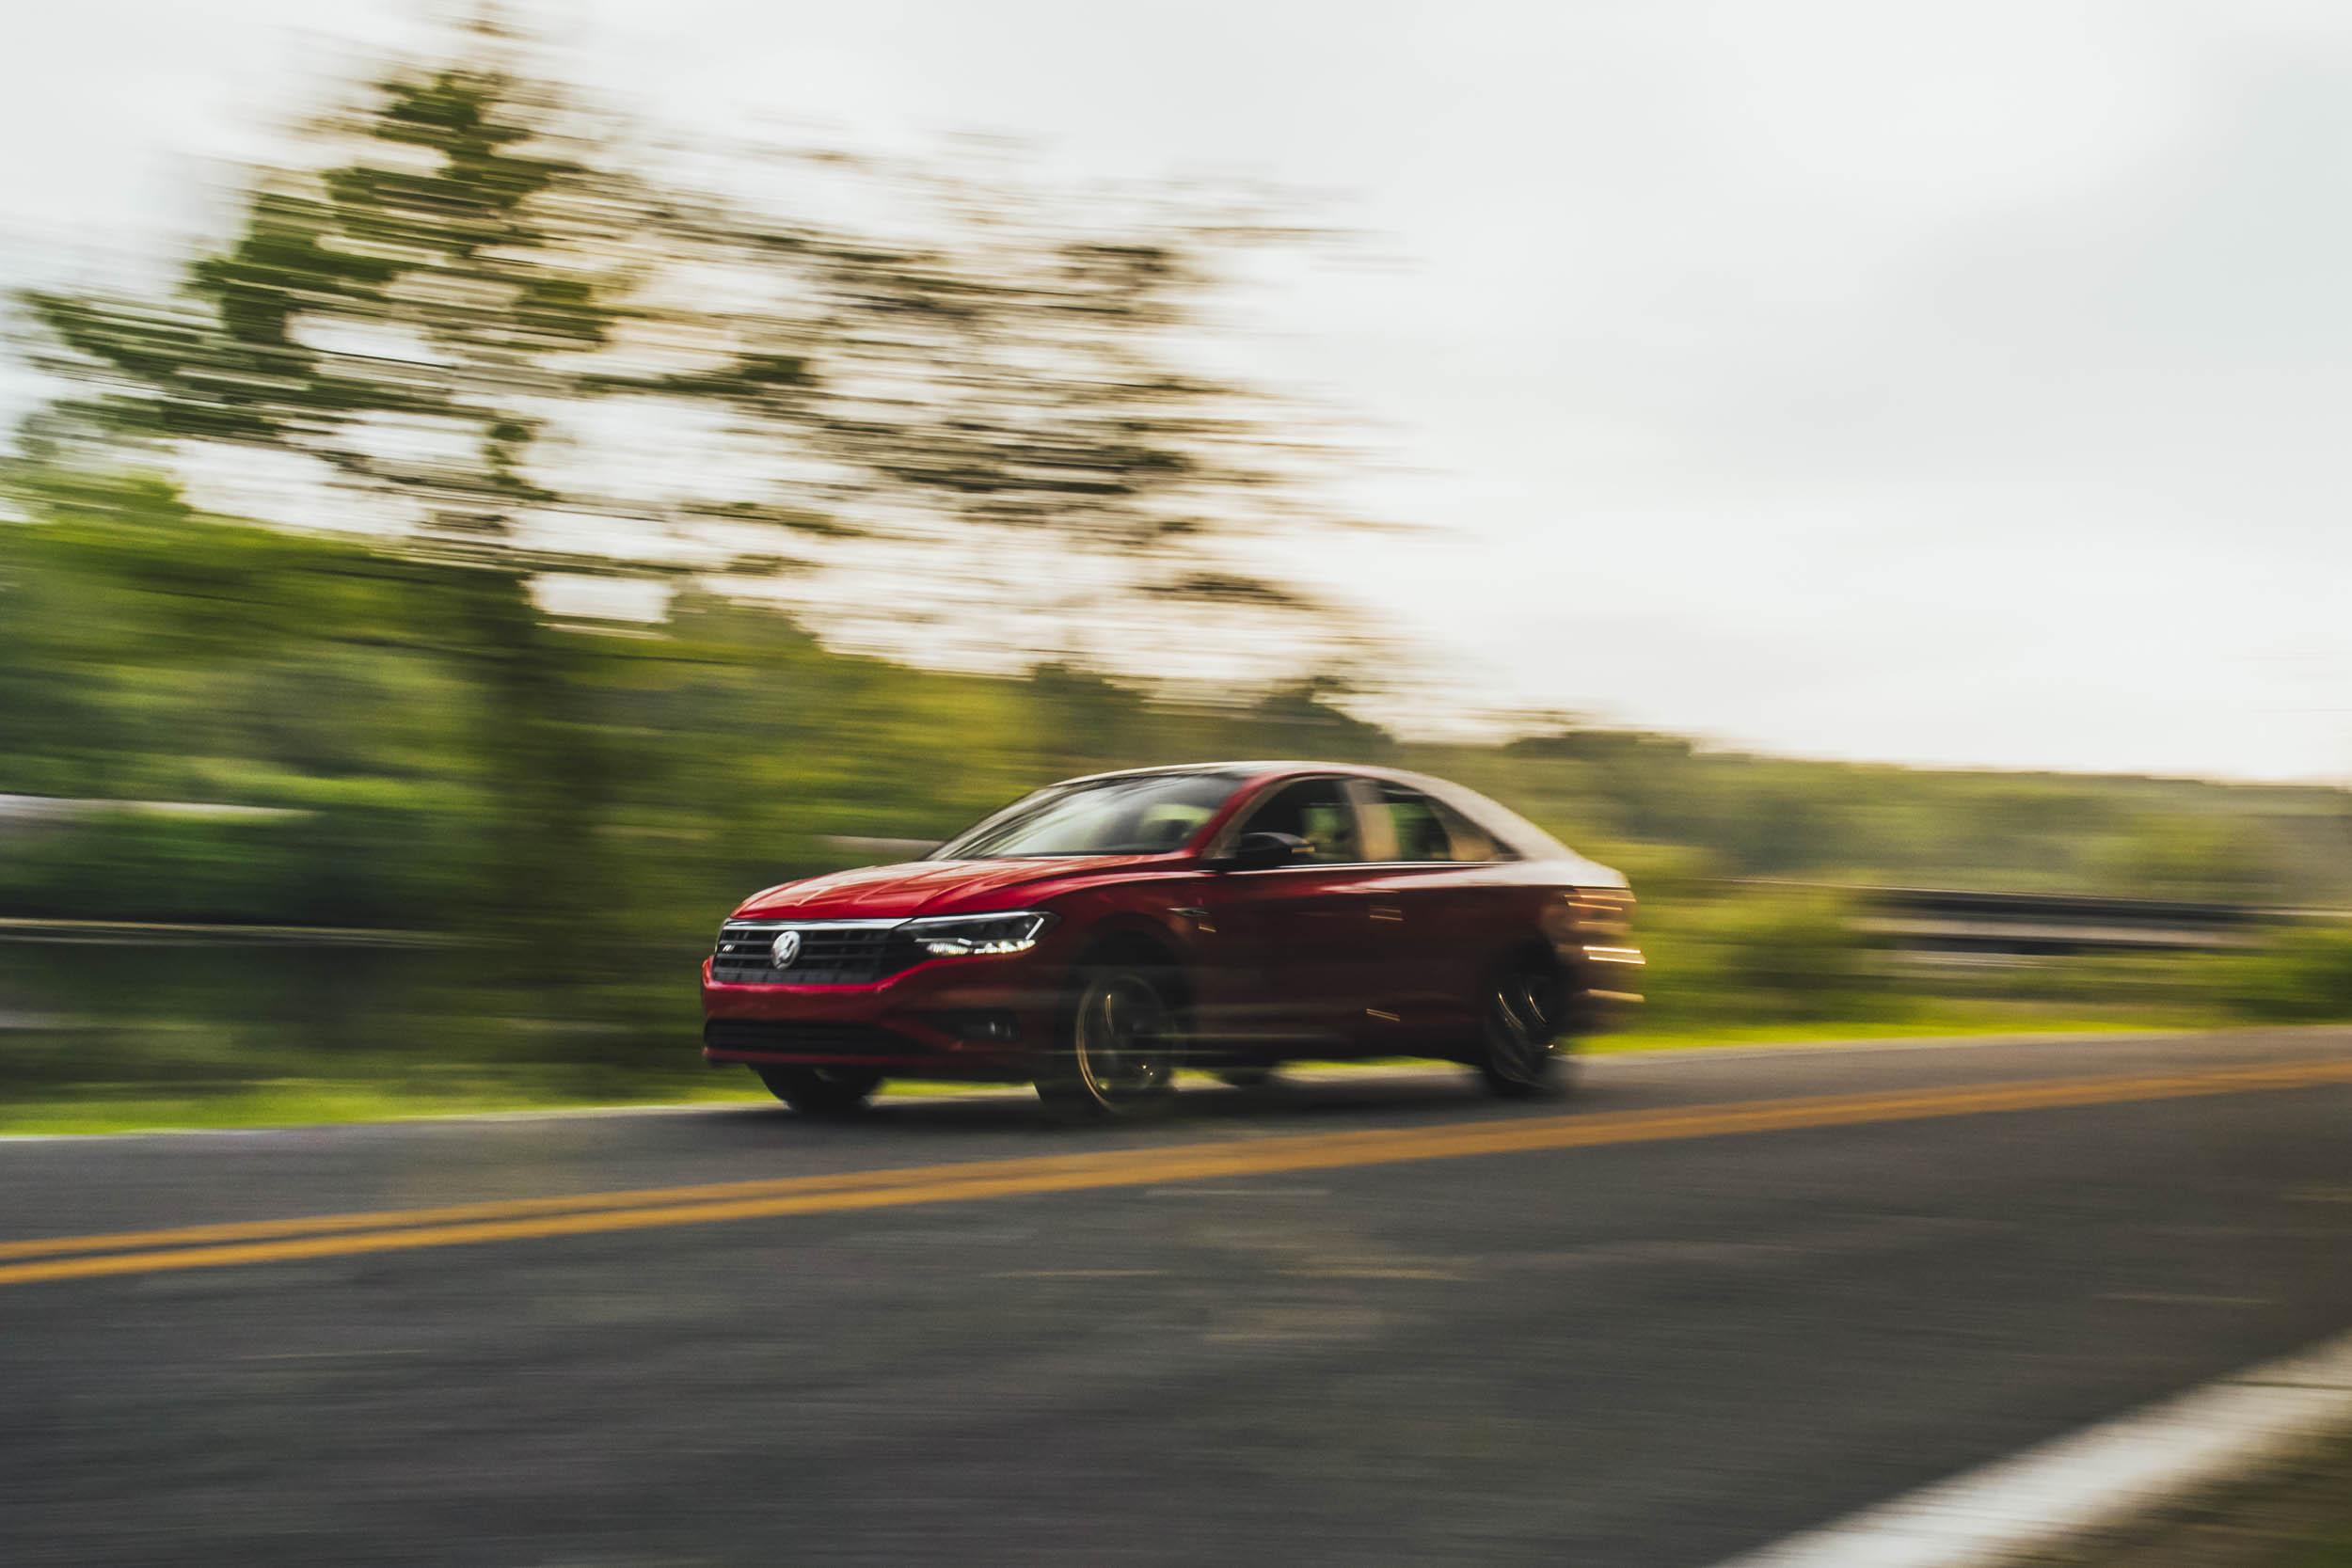 Volkswagen Jetta R-Line driving on road